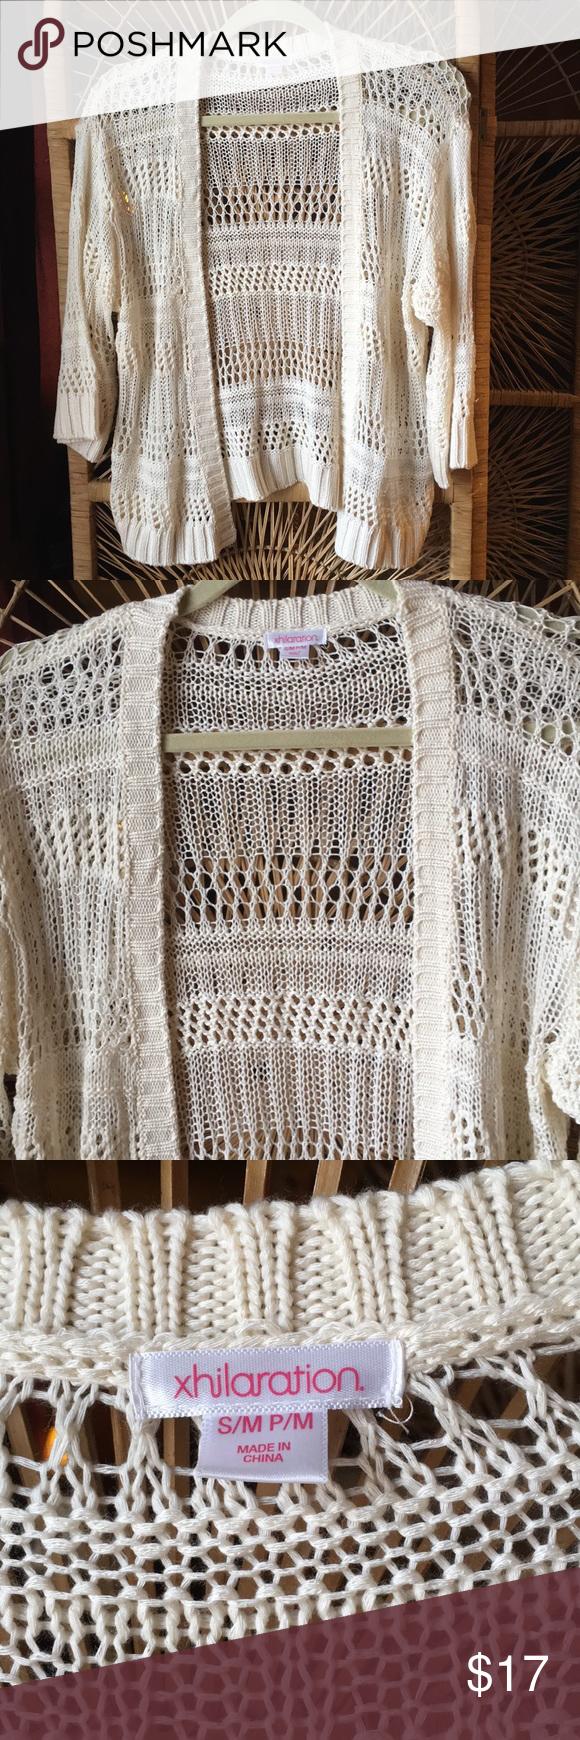 XHILARATION Knitted Cover Up Cardigan 34 Sleeves | Cardigan